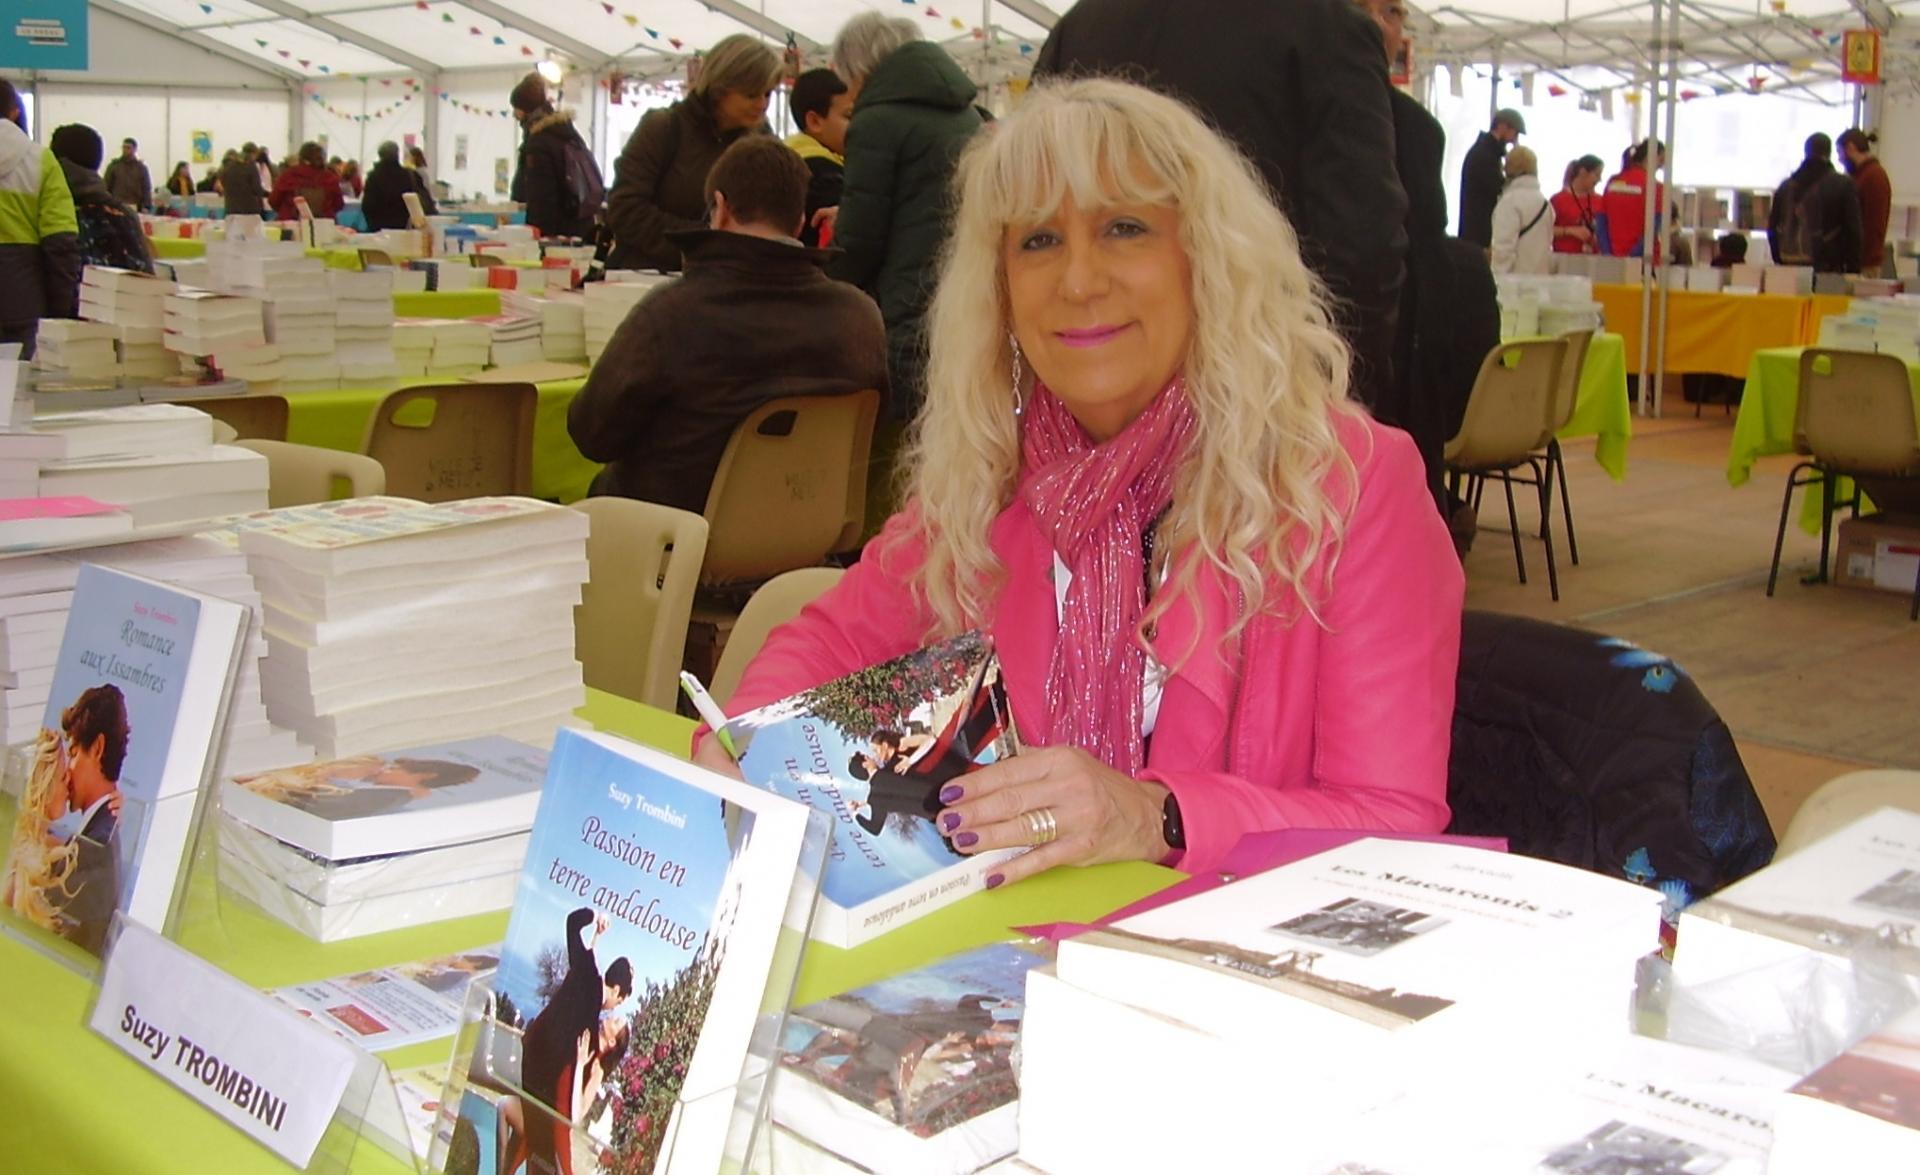 Suzy Trombini Auteure de romans